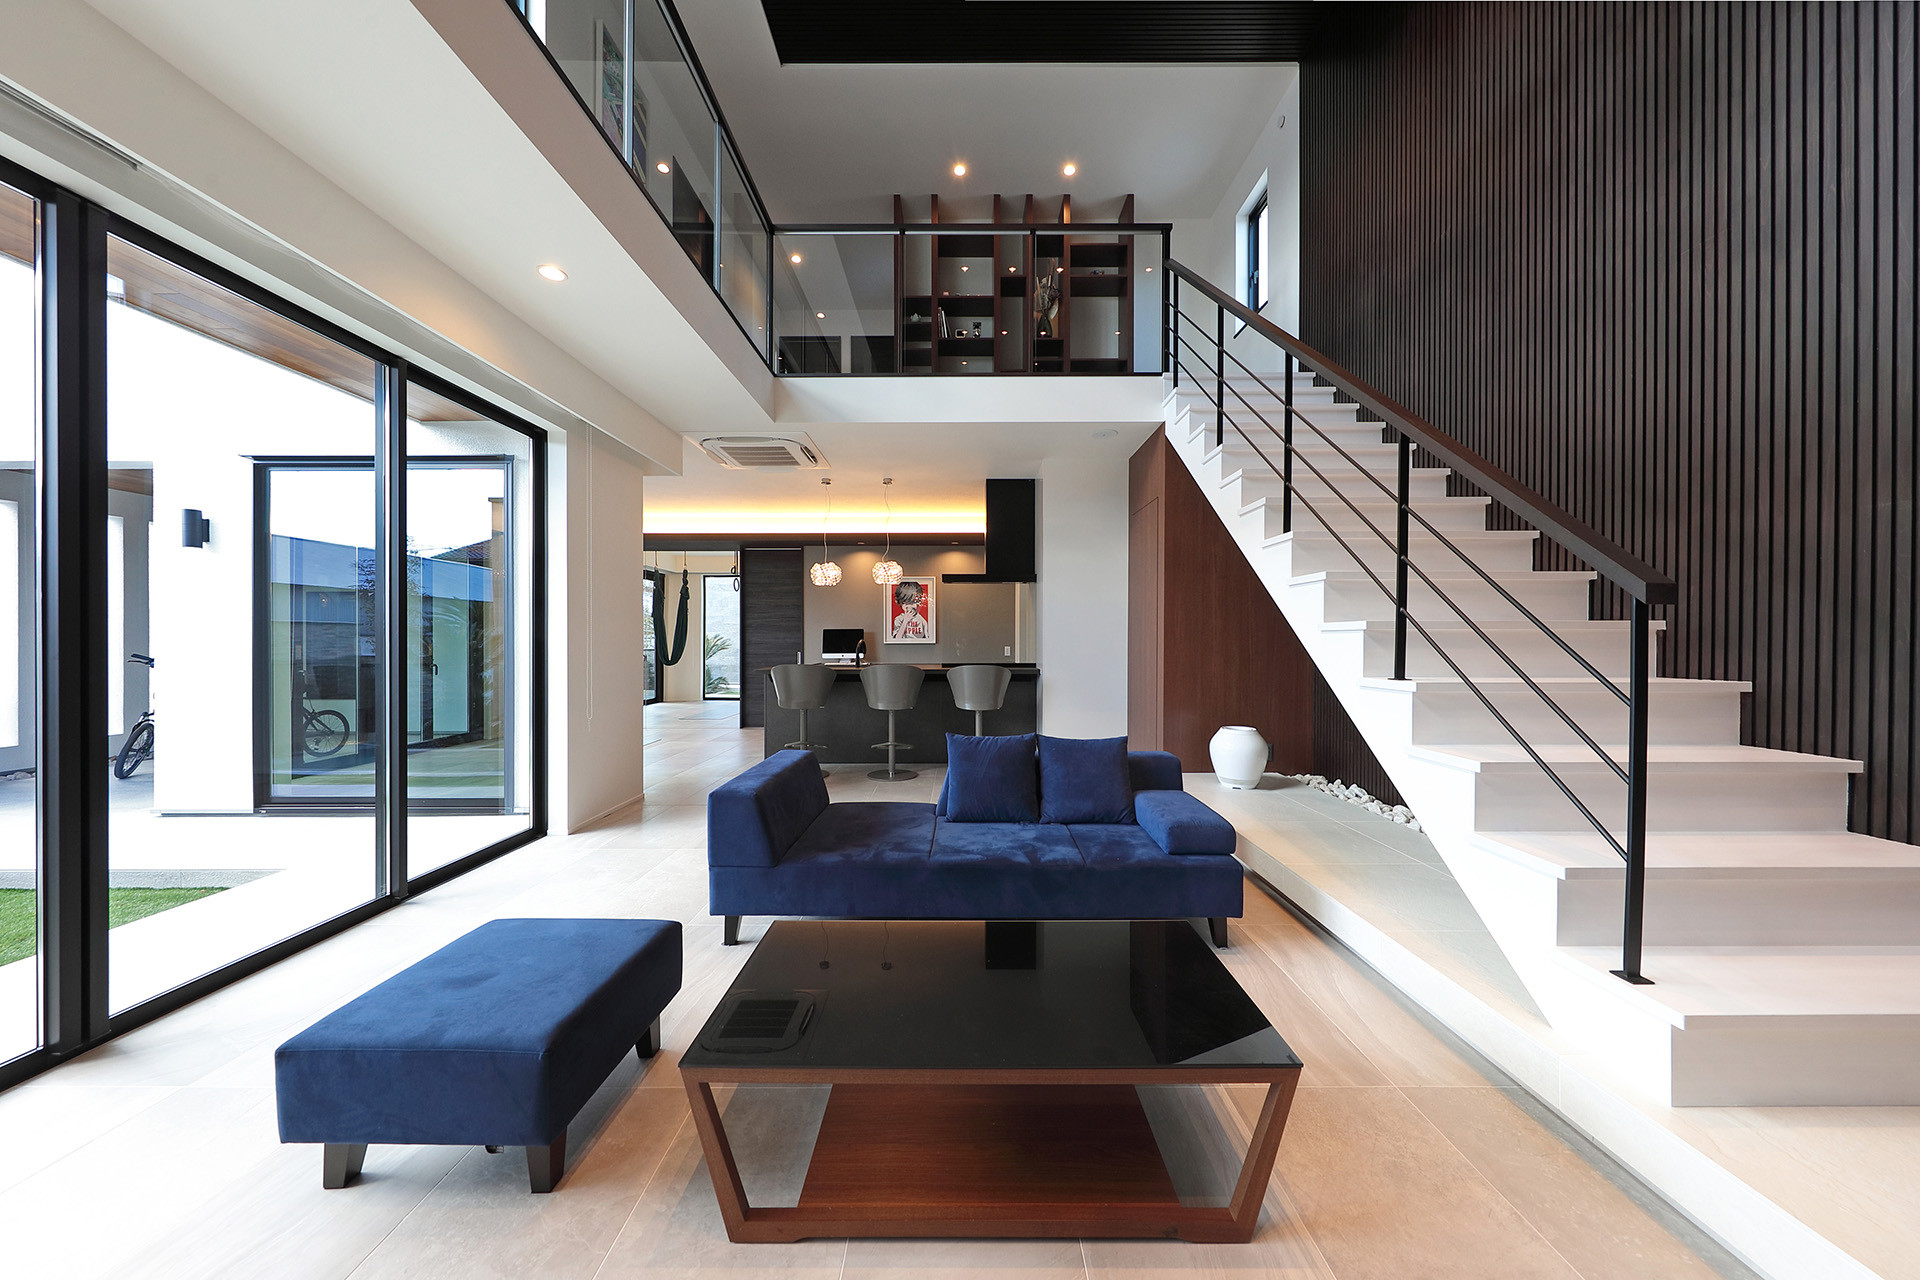 pw17_ウォーターガーデンを眺めながらヨガを愉しめる邸宅